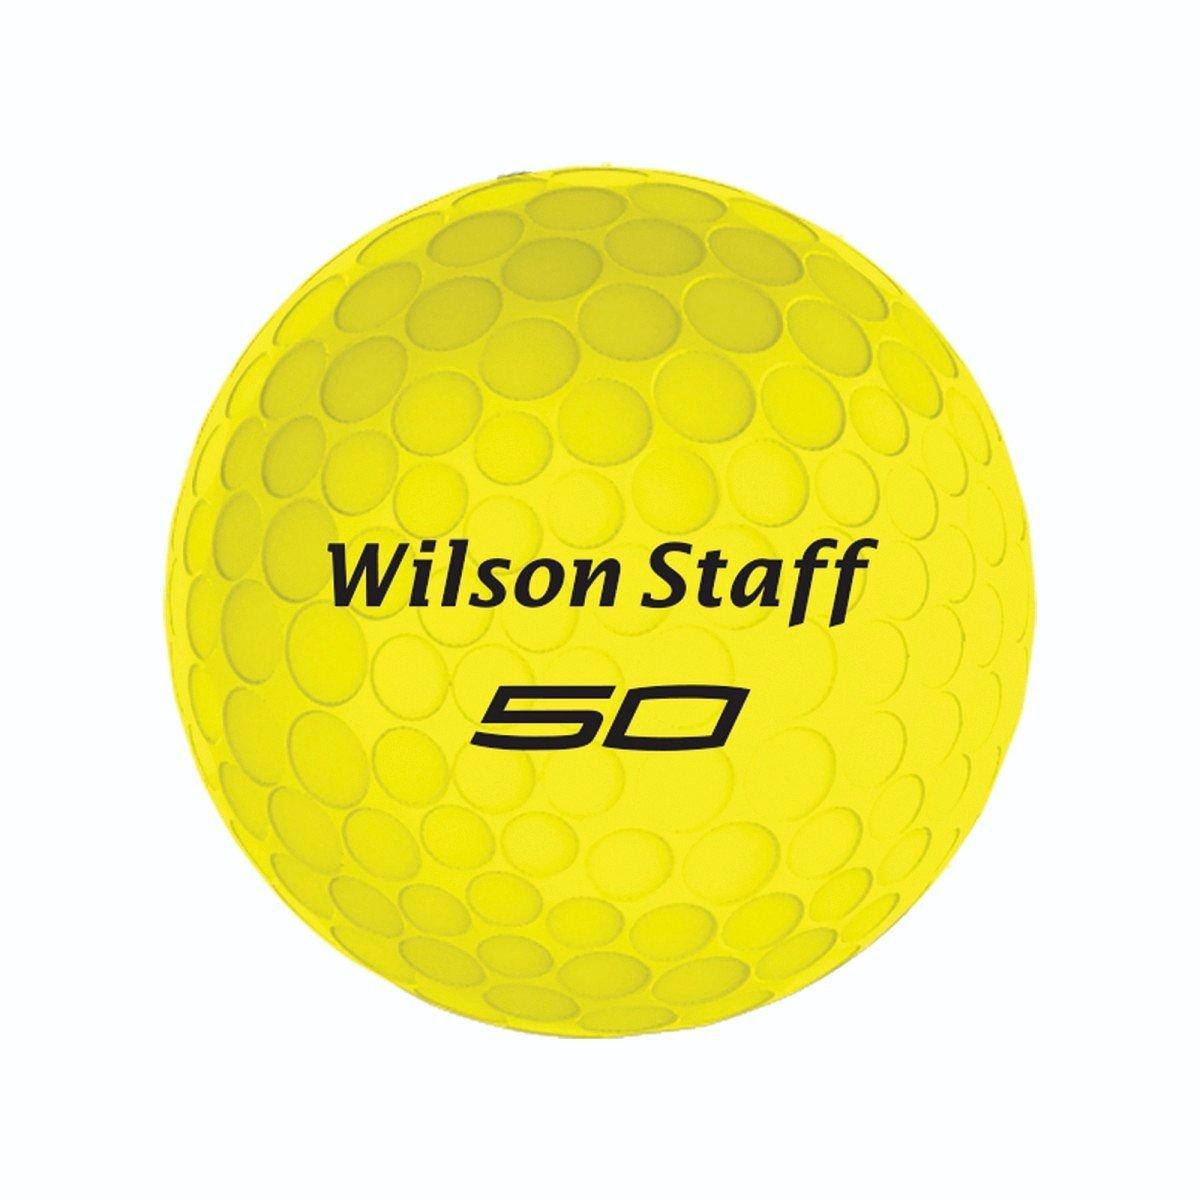 amazon com wilson staff fifty elite golf balls orange pack of